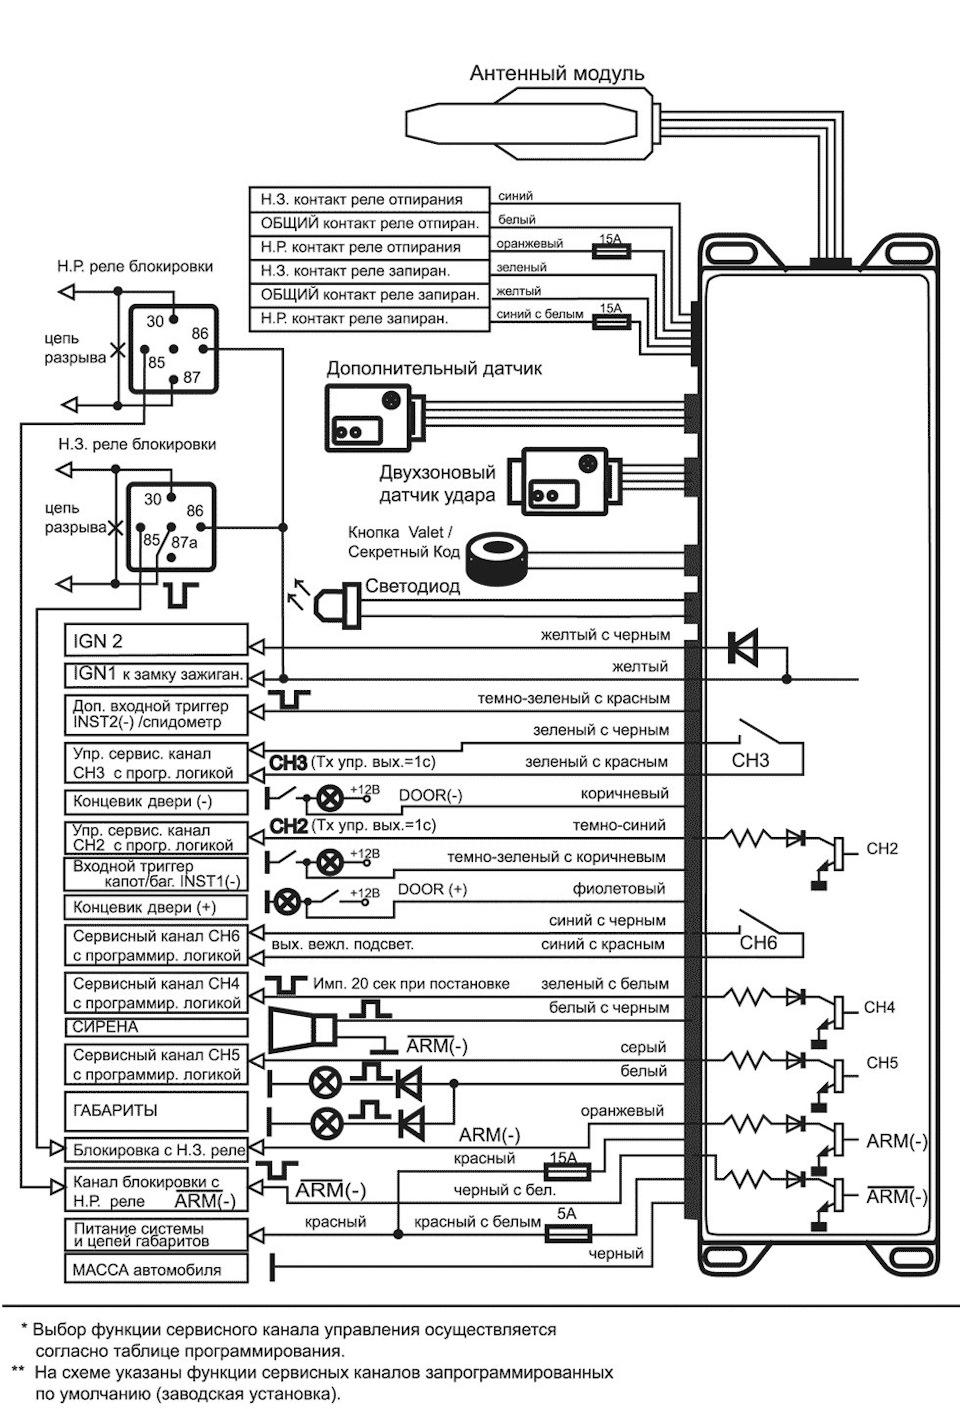 Транспортер сигнализация установка транспортер в германии купить